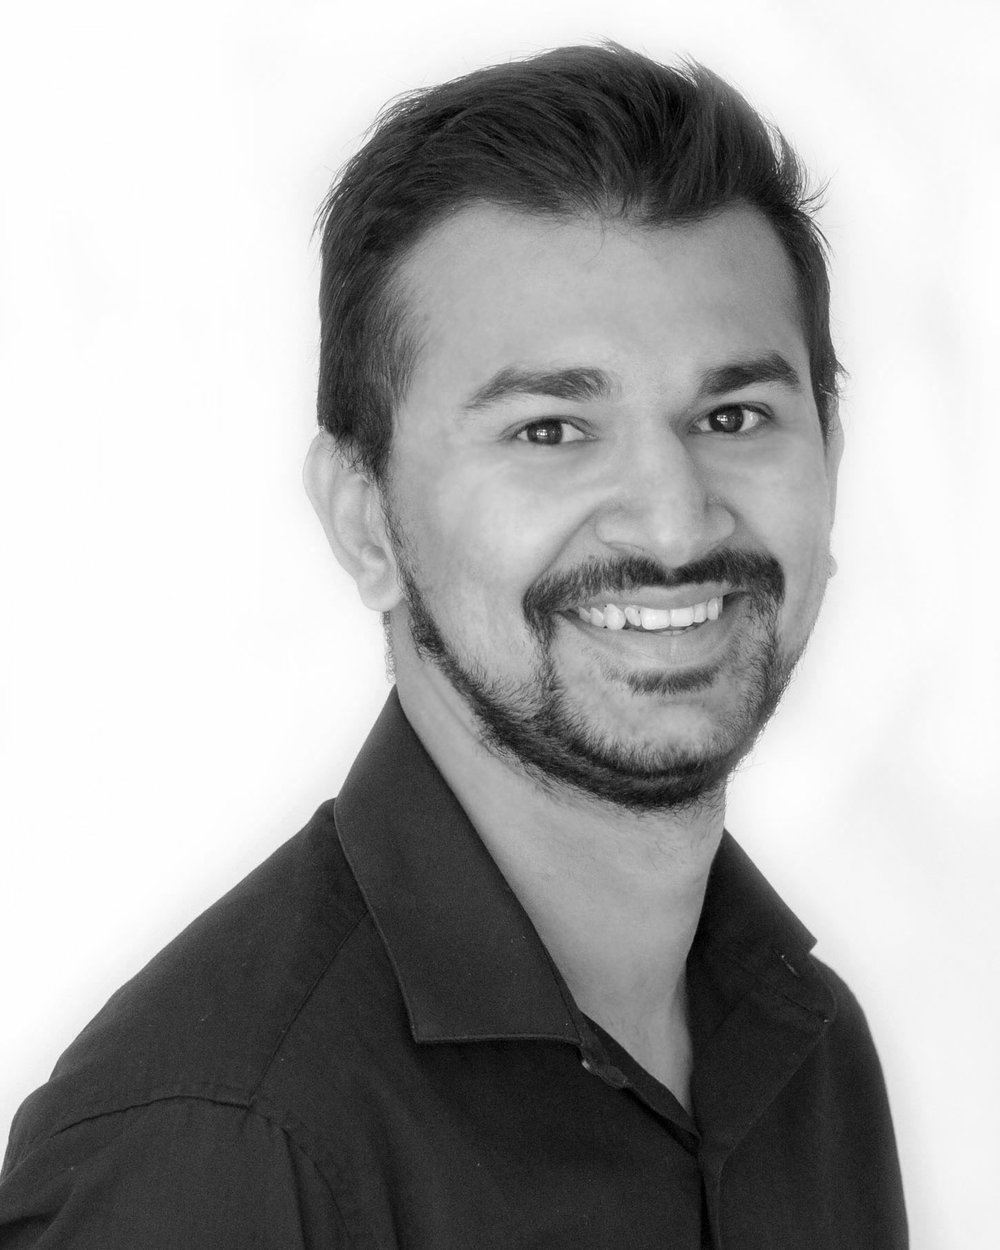 Arjun-black and white.jpg